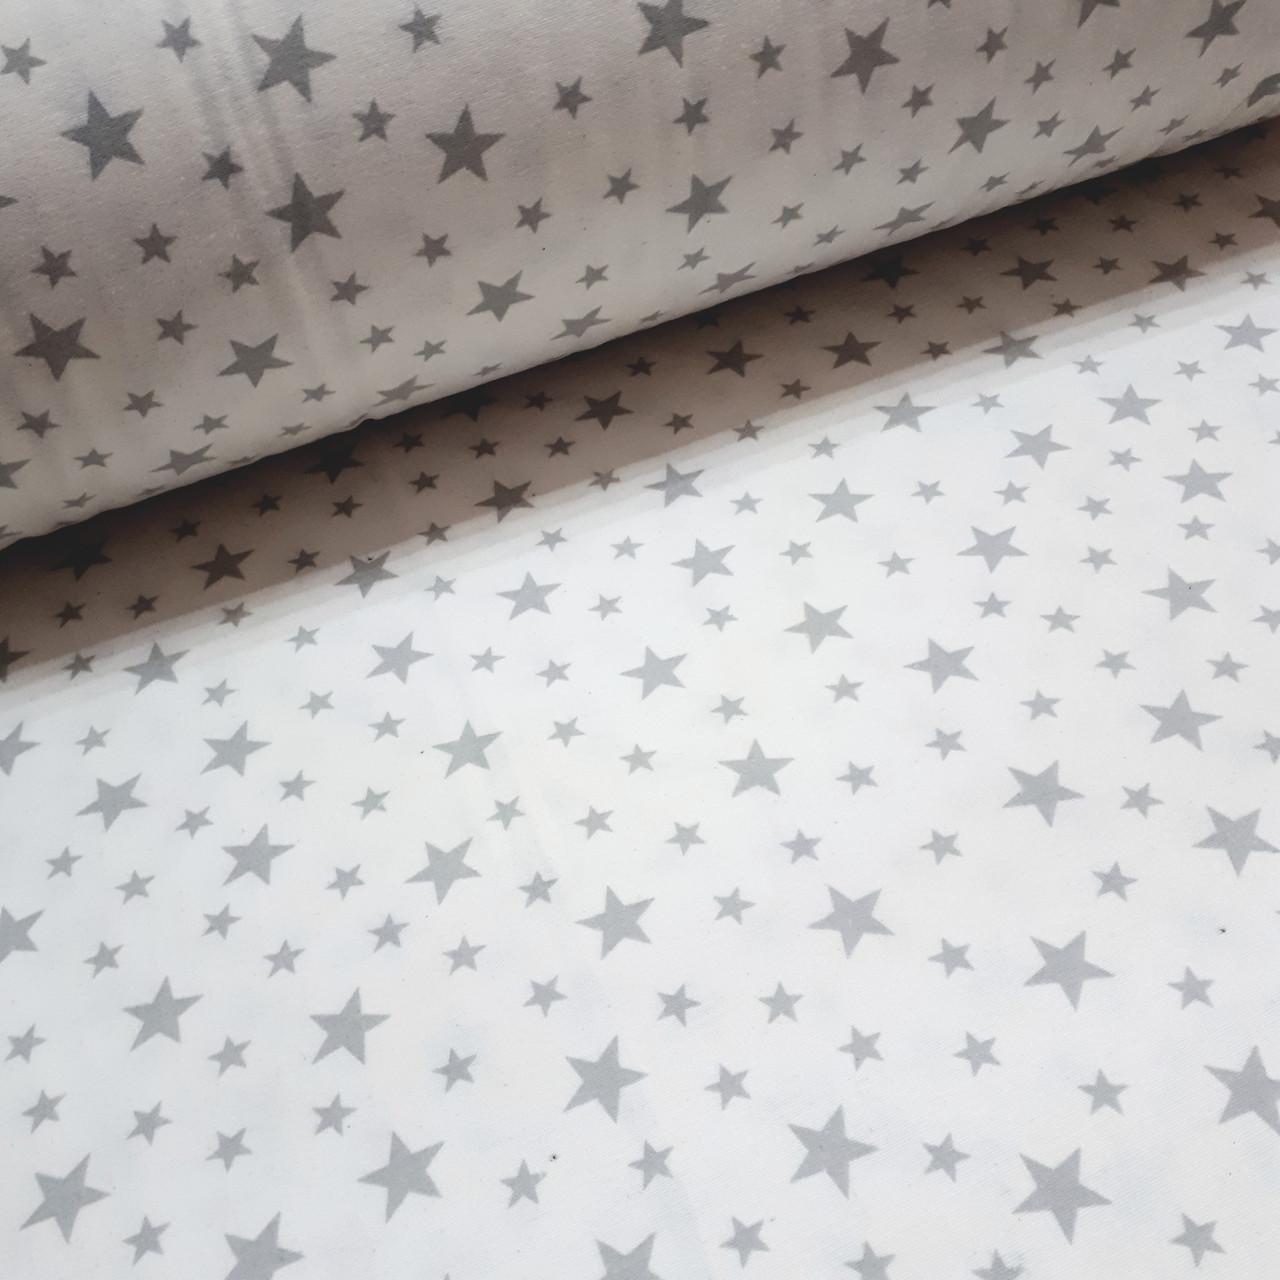 Фланелевая ткань серые звезды на белом (шир. 2,4 м)